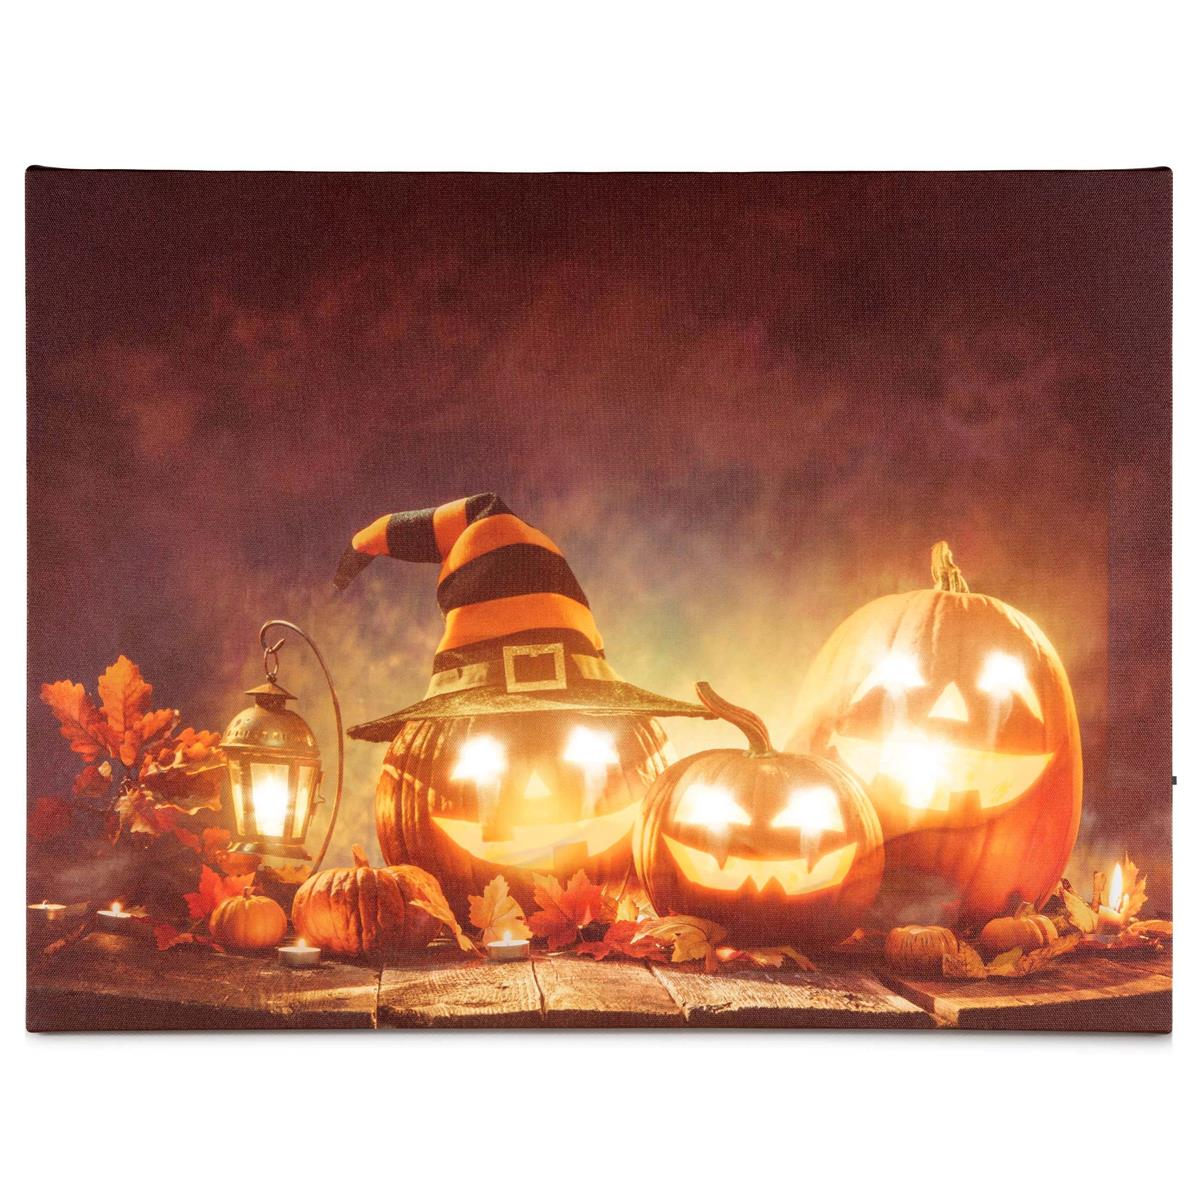 Wandbild 8 LED Kunstdruck mit Beleuchtung Happy Halloween warmweiß 30x40 cm Batt